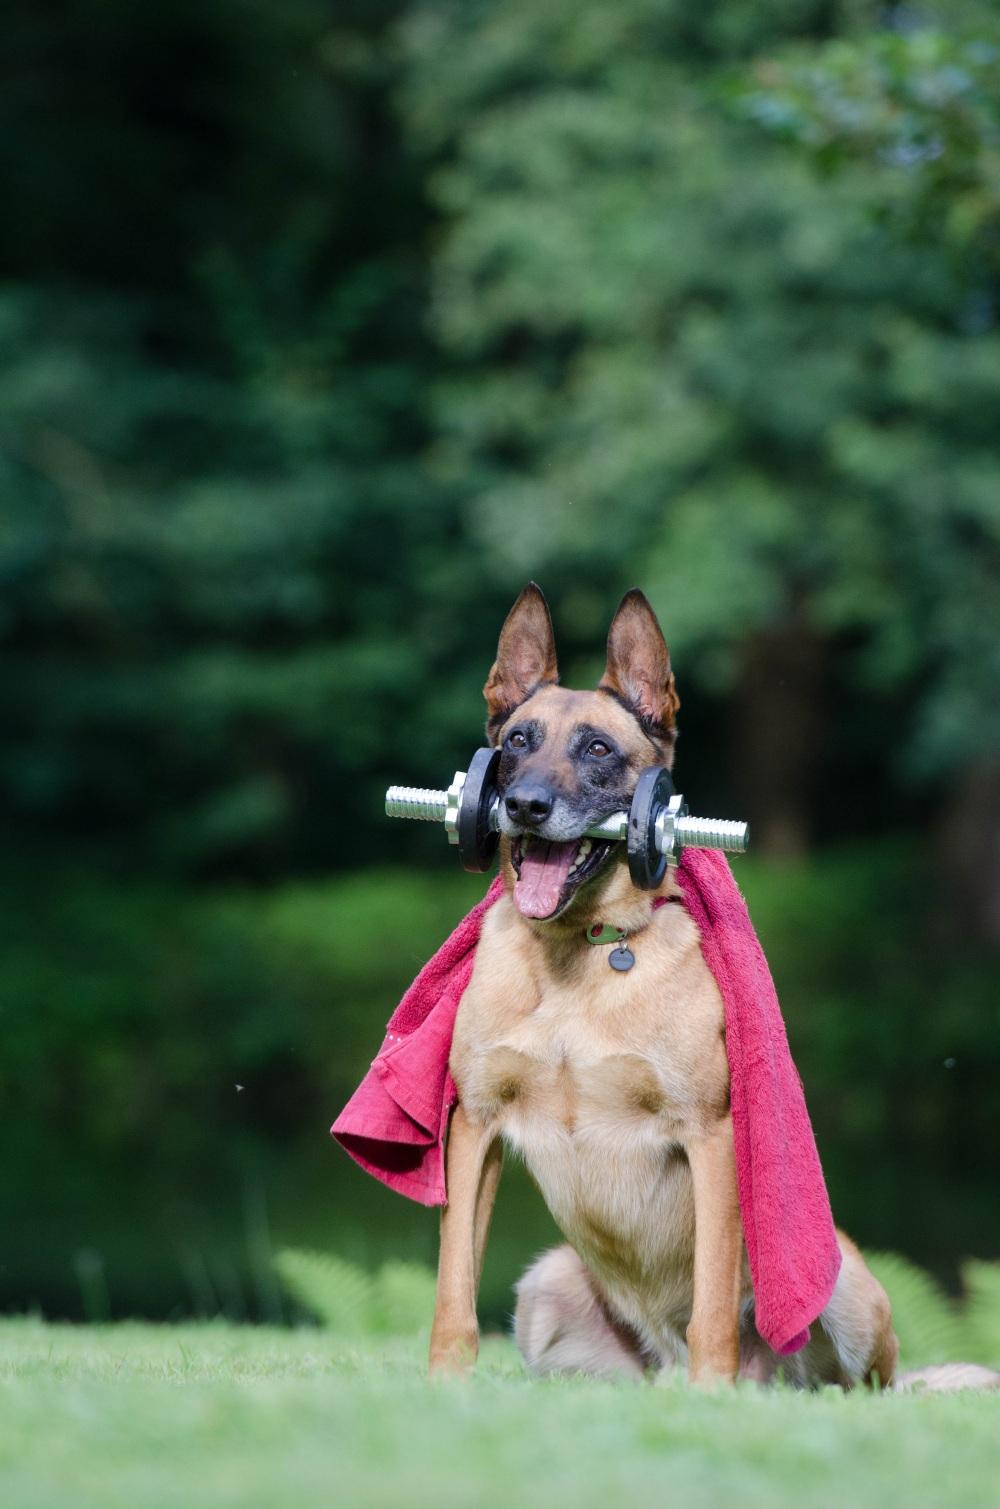 trick-dog-trick-malinois-dog-show-trick-37735.jpeg